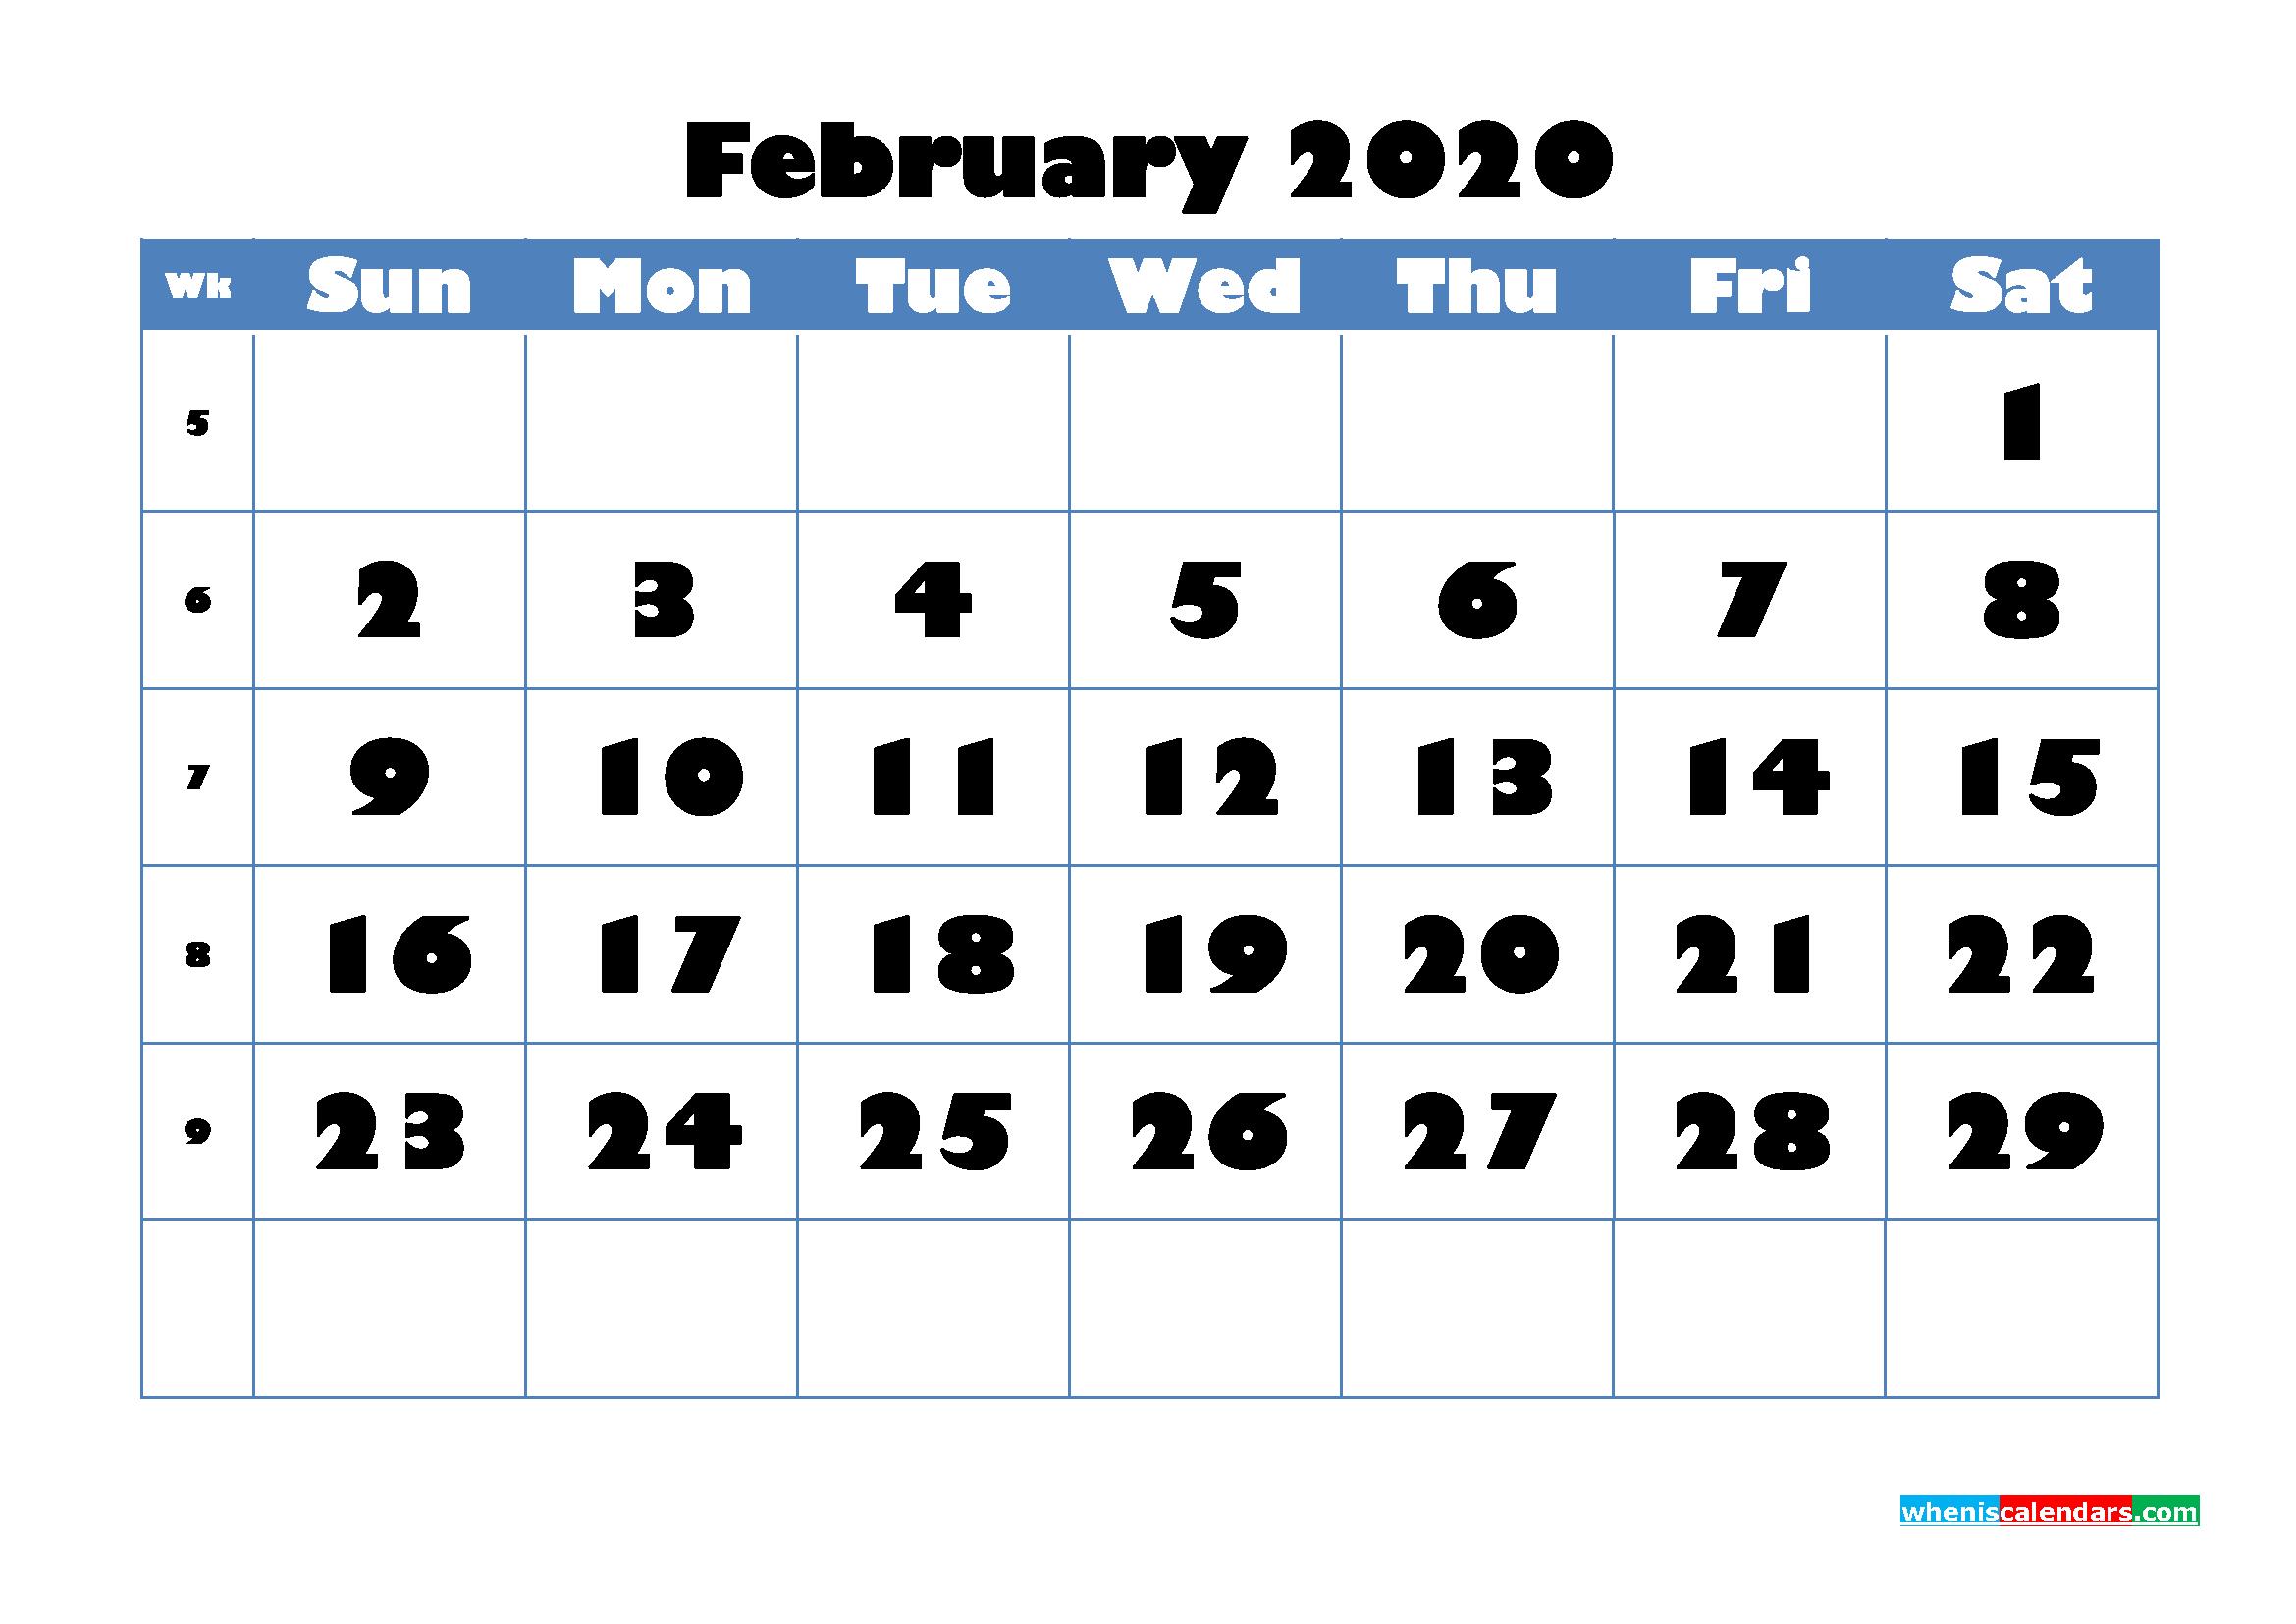 February 2020 Blank Calendar Printable - No.m20b710